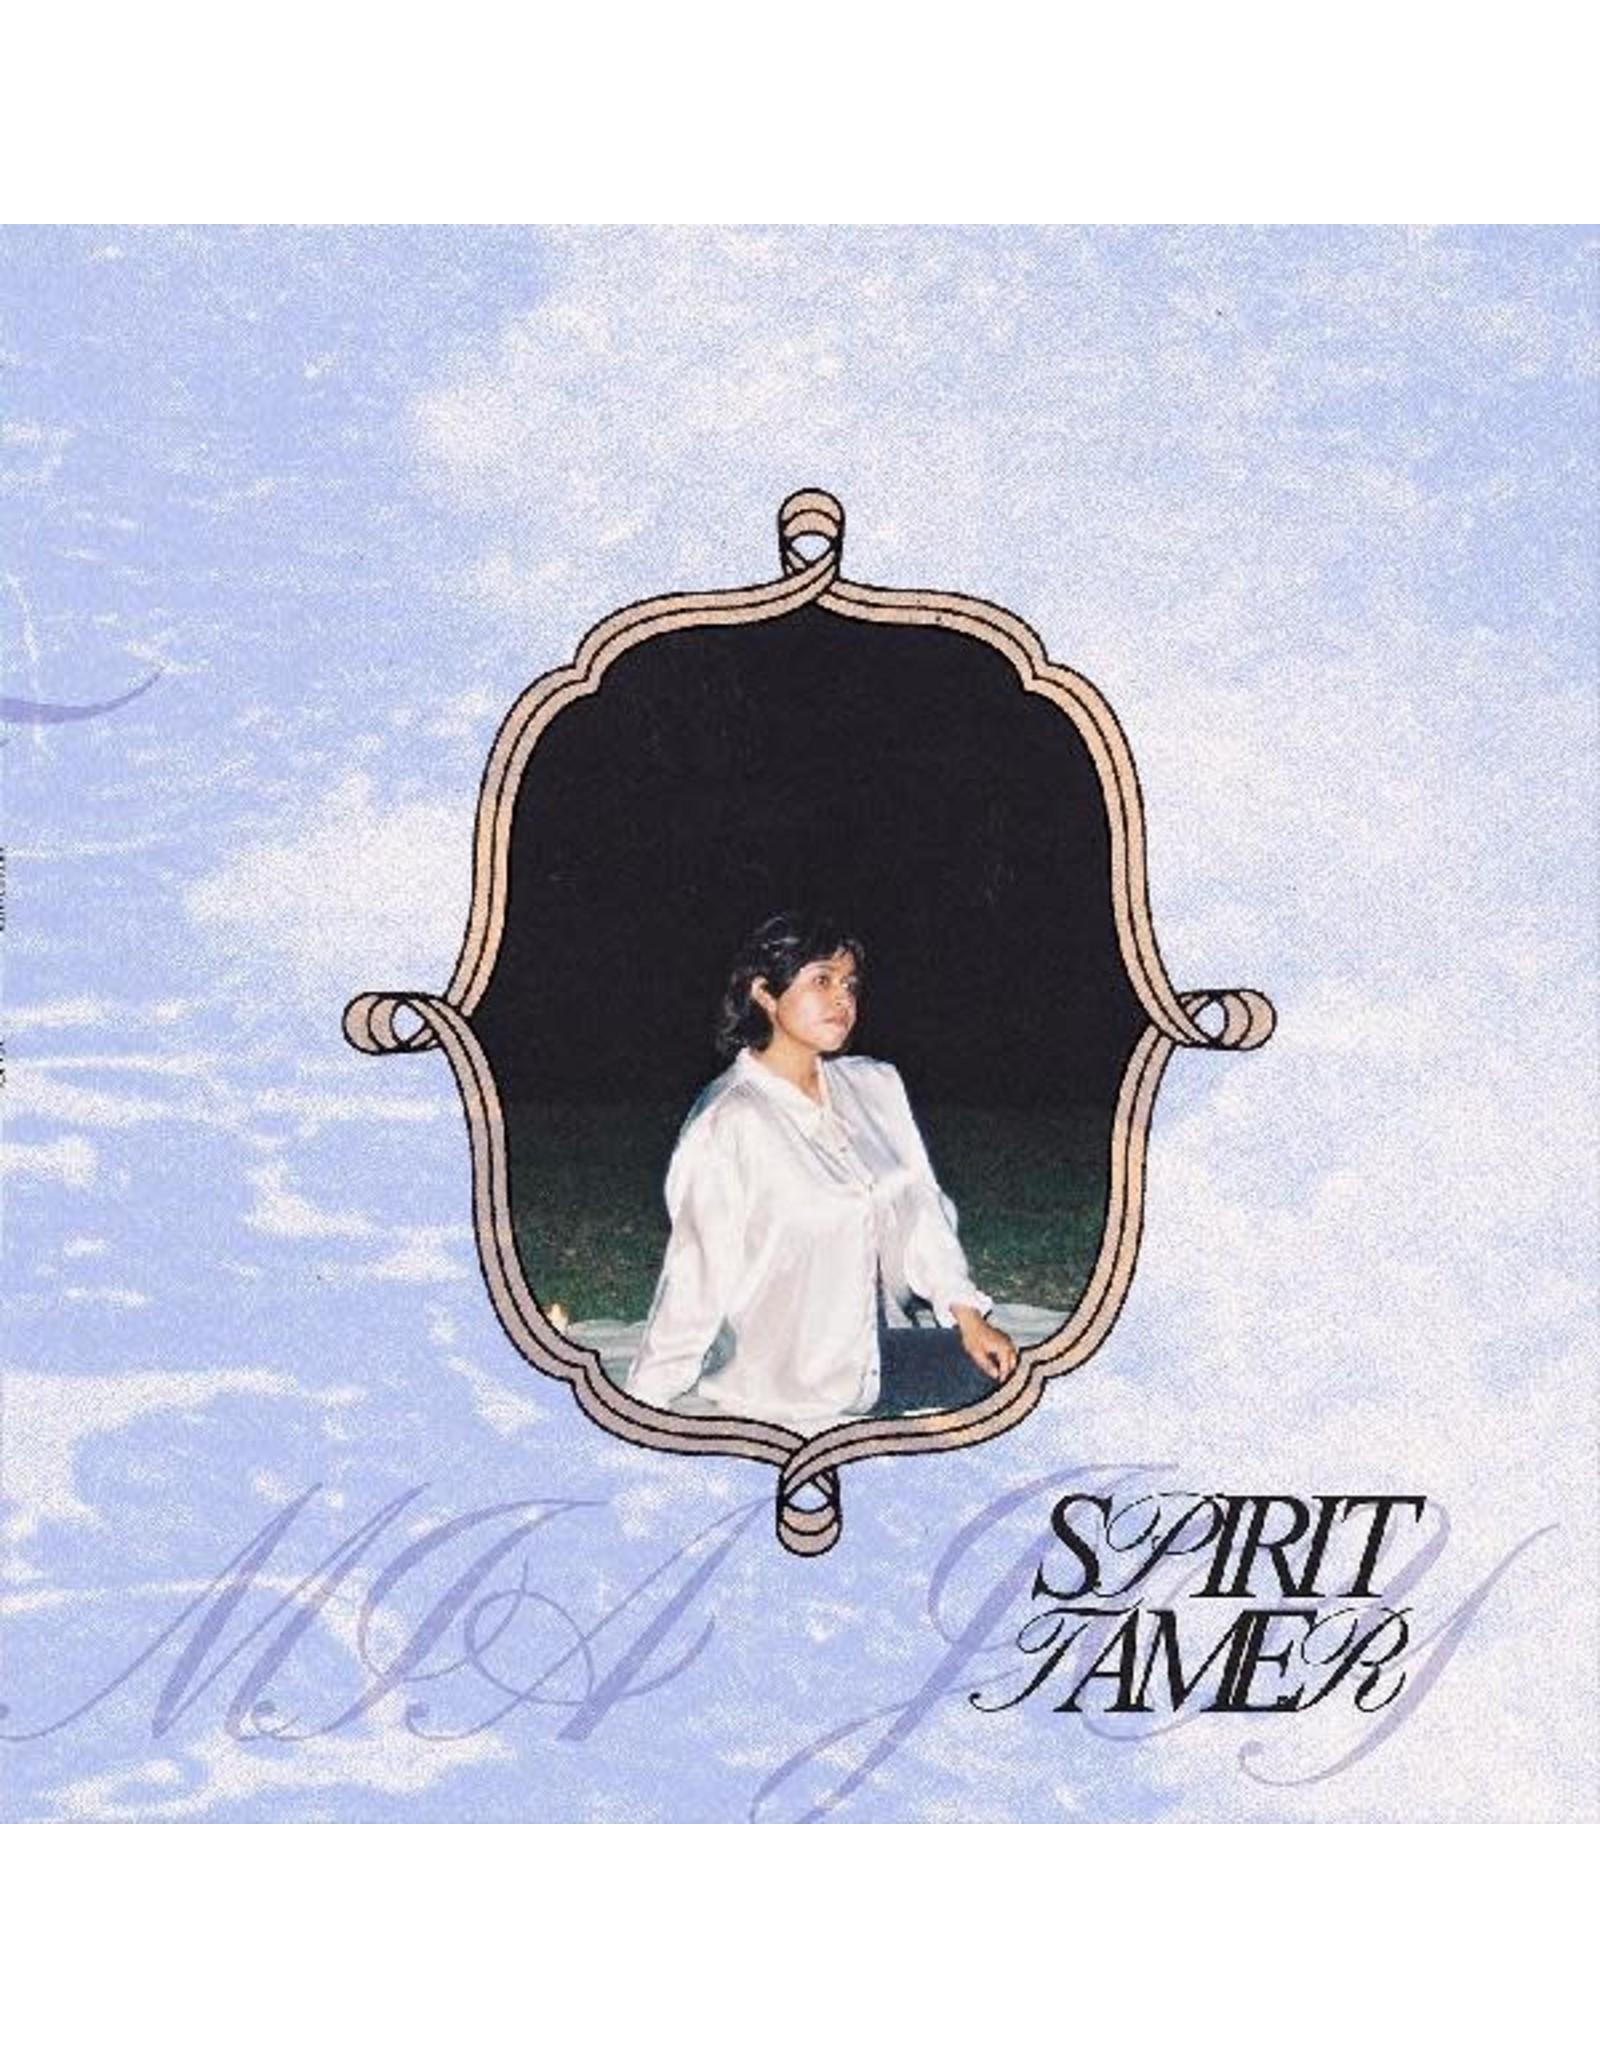 New Vinyl Mia Joy - Spirit Tamer (Colored) LP